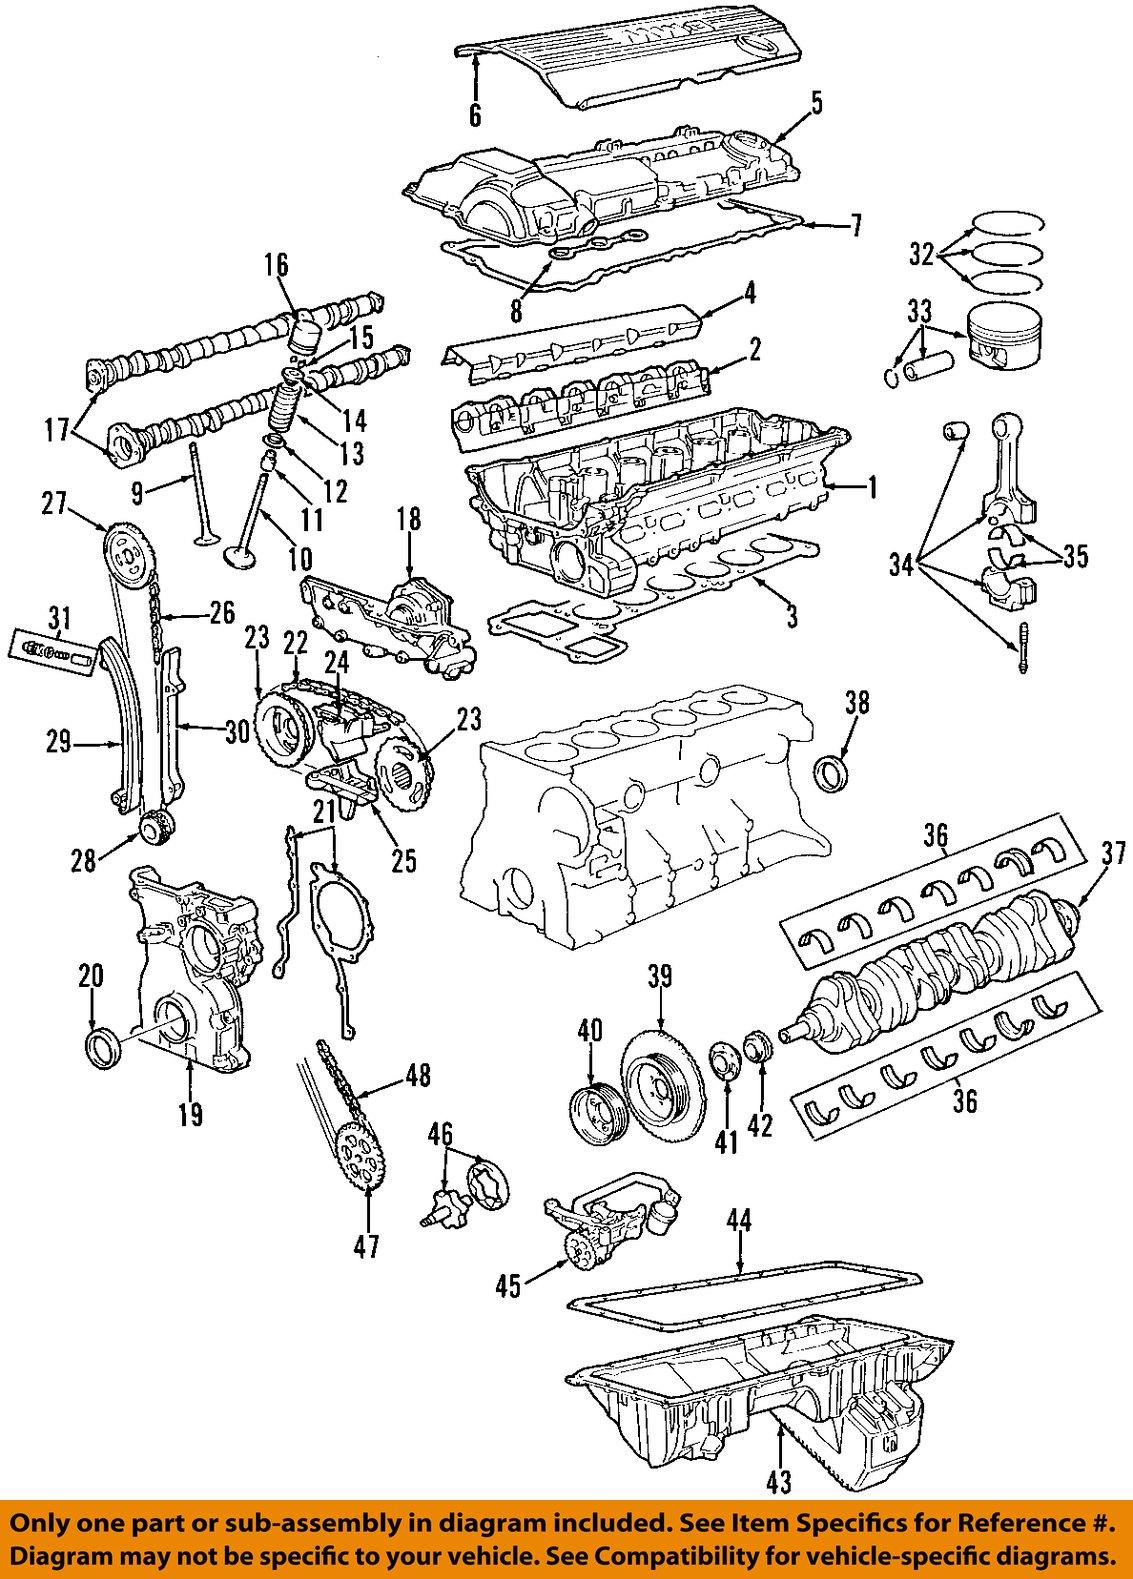 2006 bmw 325i engine diagram 2002 ford transit radio wiring e46 330xi 1984 318i transmission